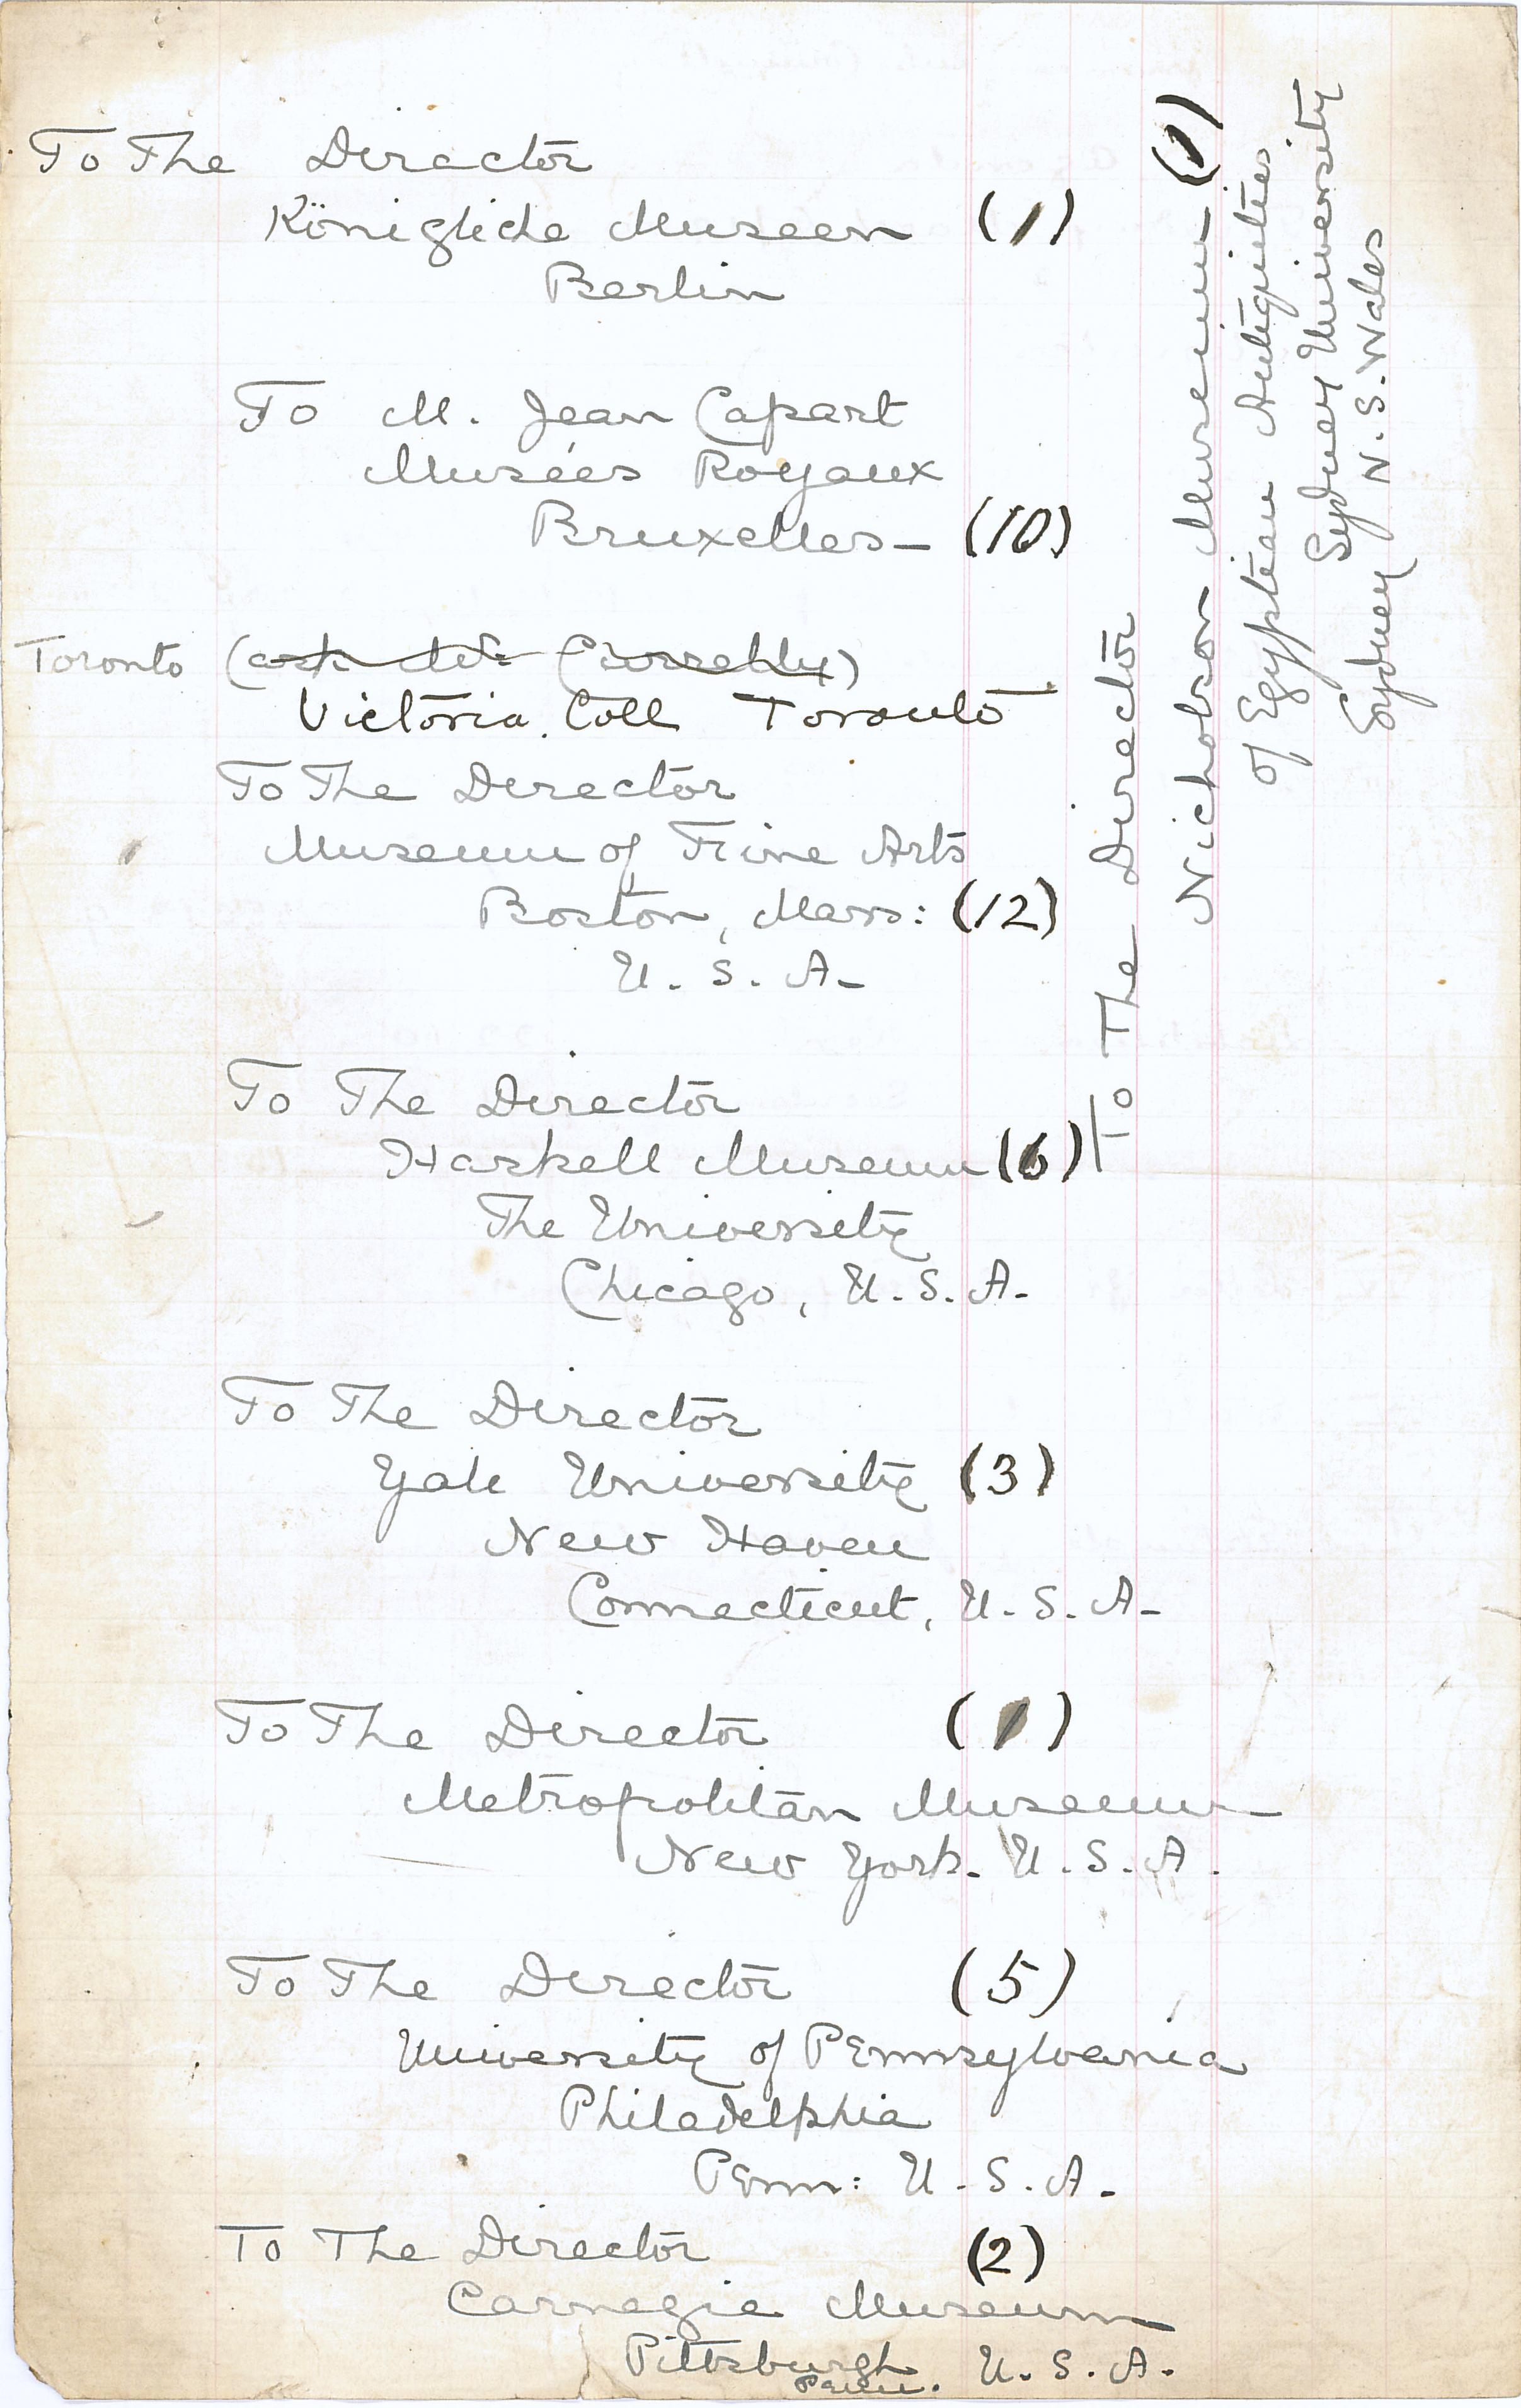 1904-05 Deir el-Bahri, Sinai, Oxyrhynchus DIST.24.01b